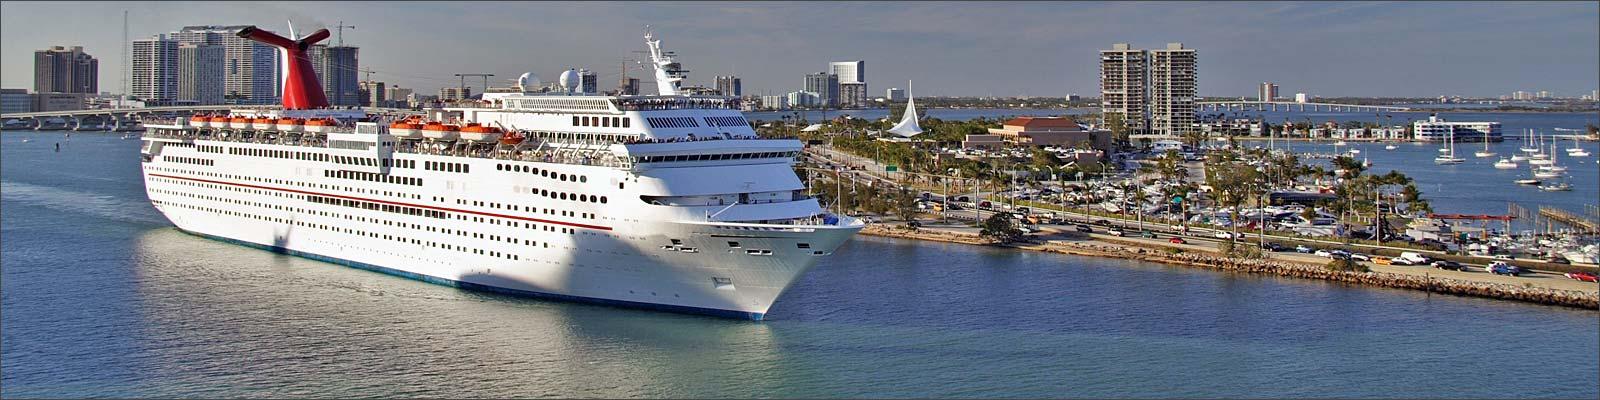 Florida-cruise